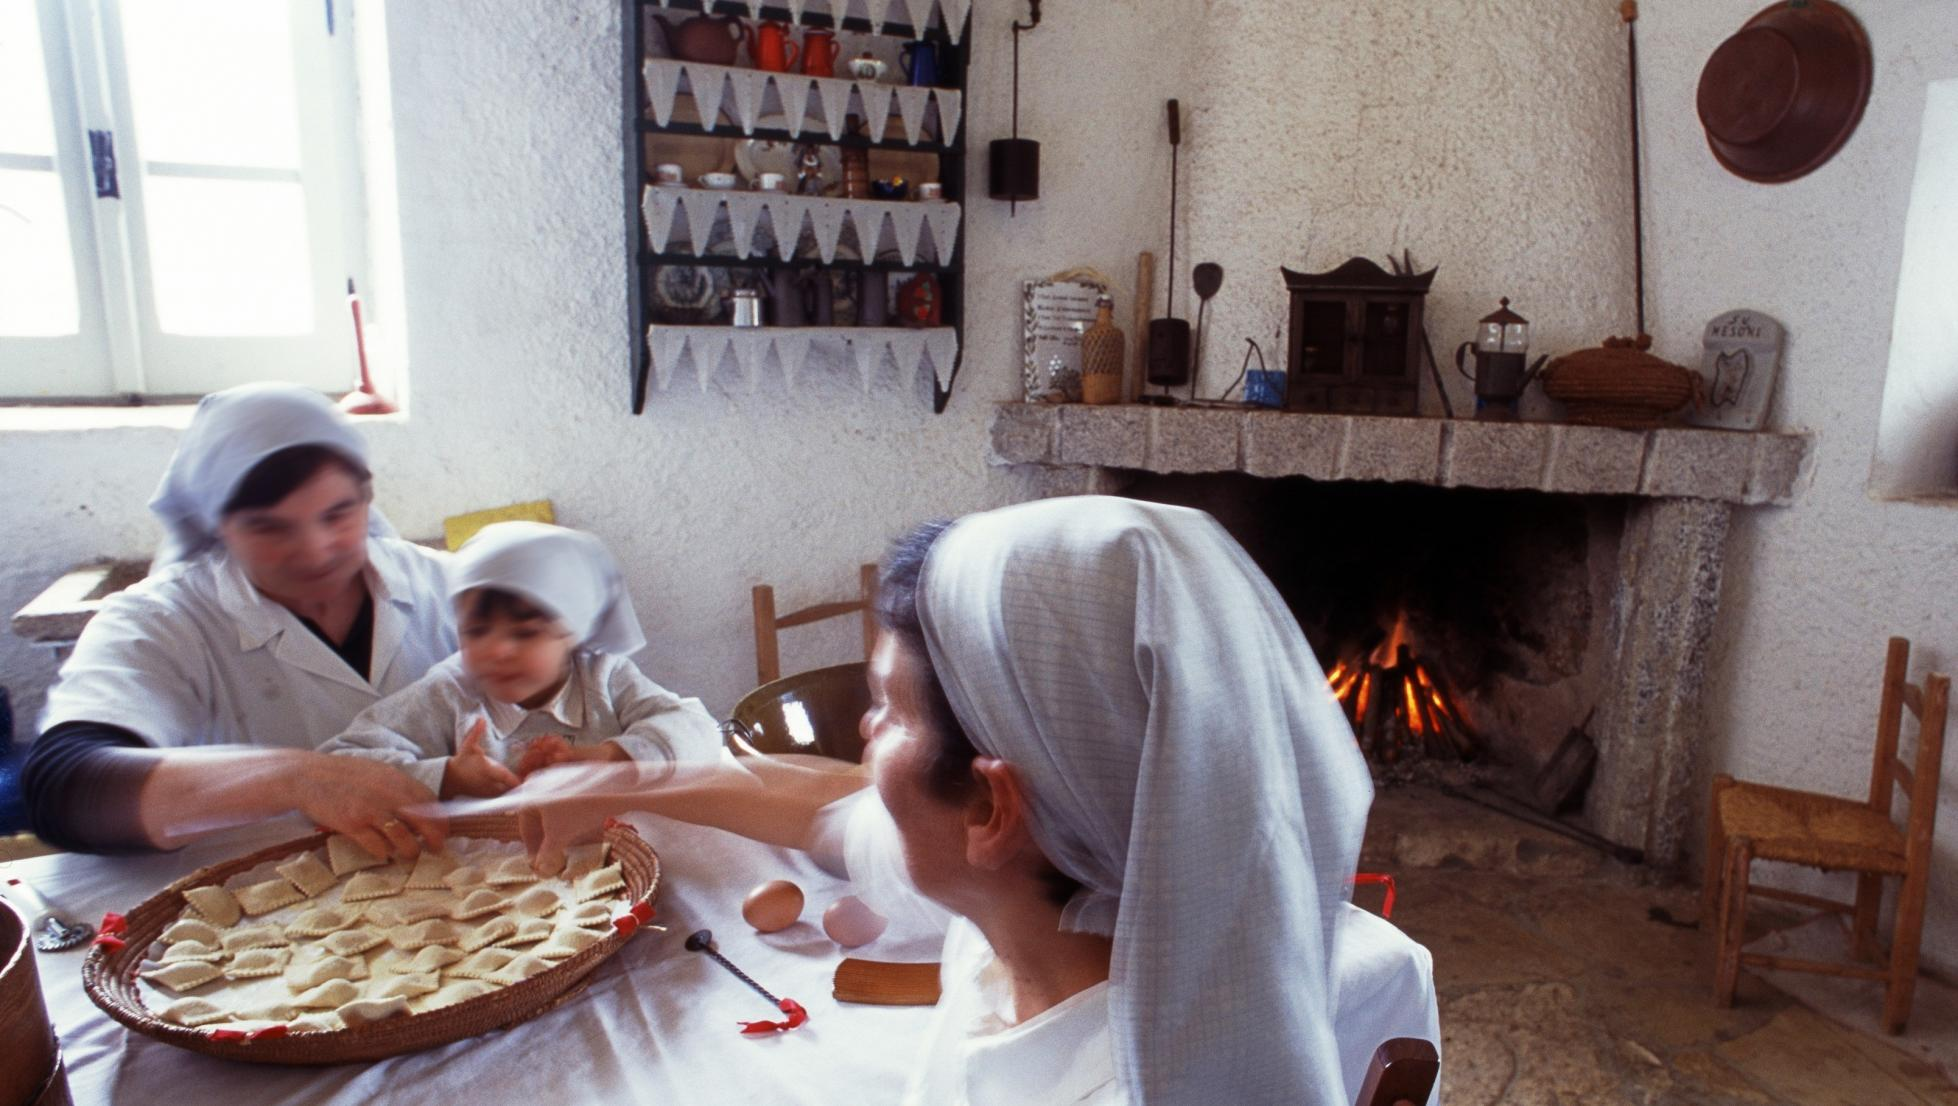 Donne che preparano ravioli - Dolianova